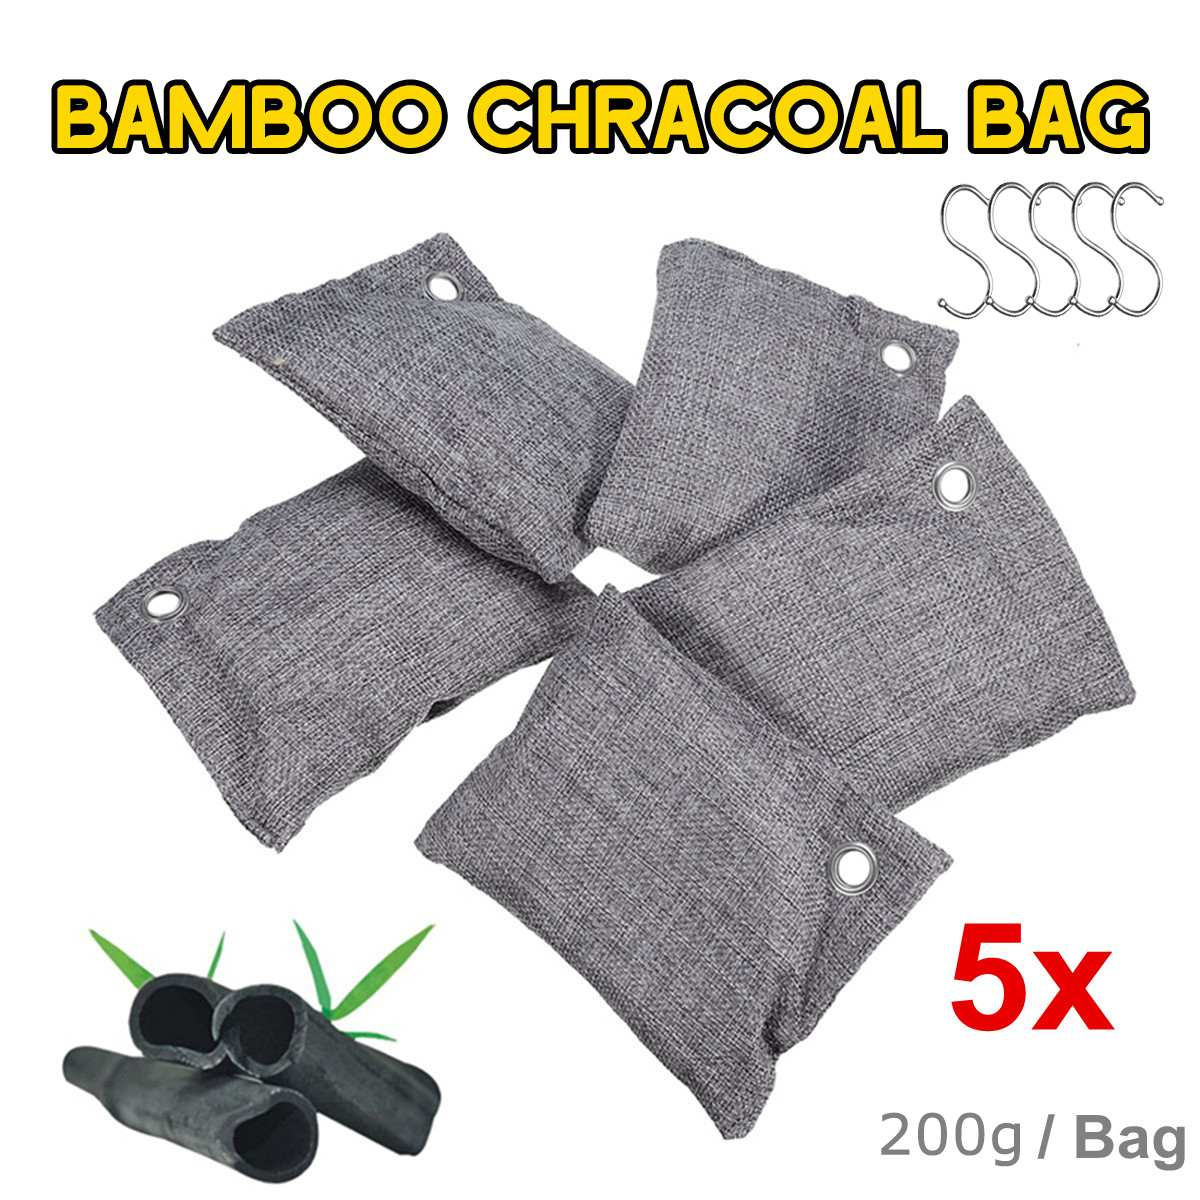 5 Bag/Set Air Purifier Bag Car Home Bamboo Charcoal Dehumidifier Odor Remover Air Purifying Bag Natural Air Freshener Bags 500g